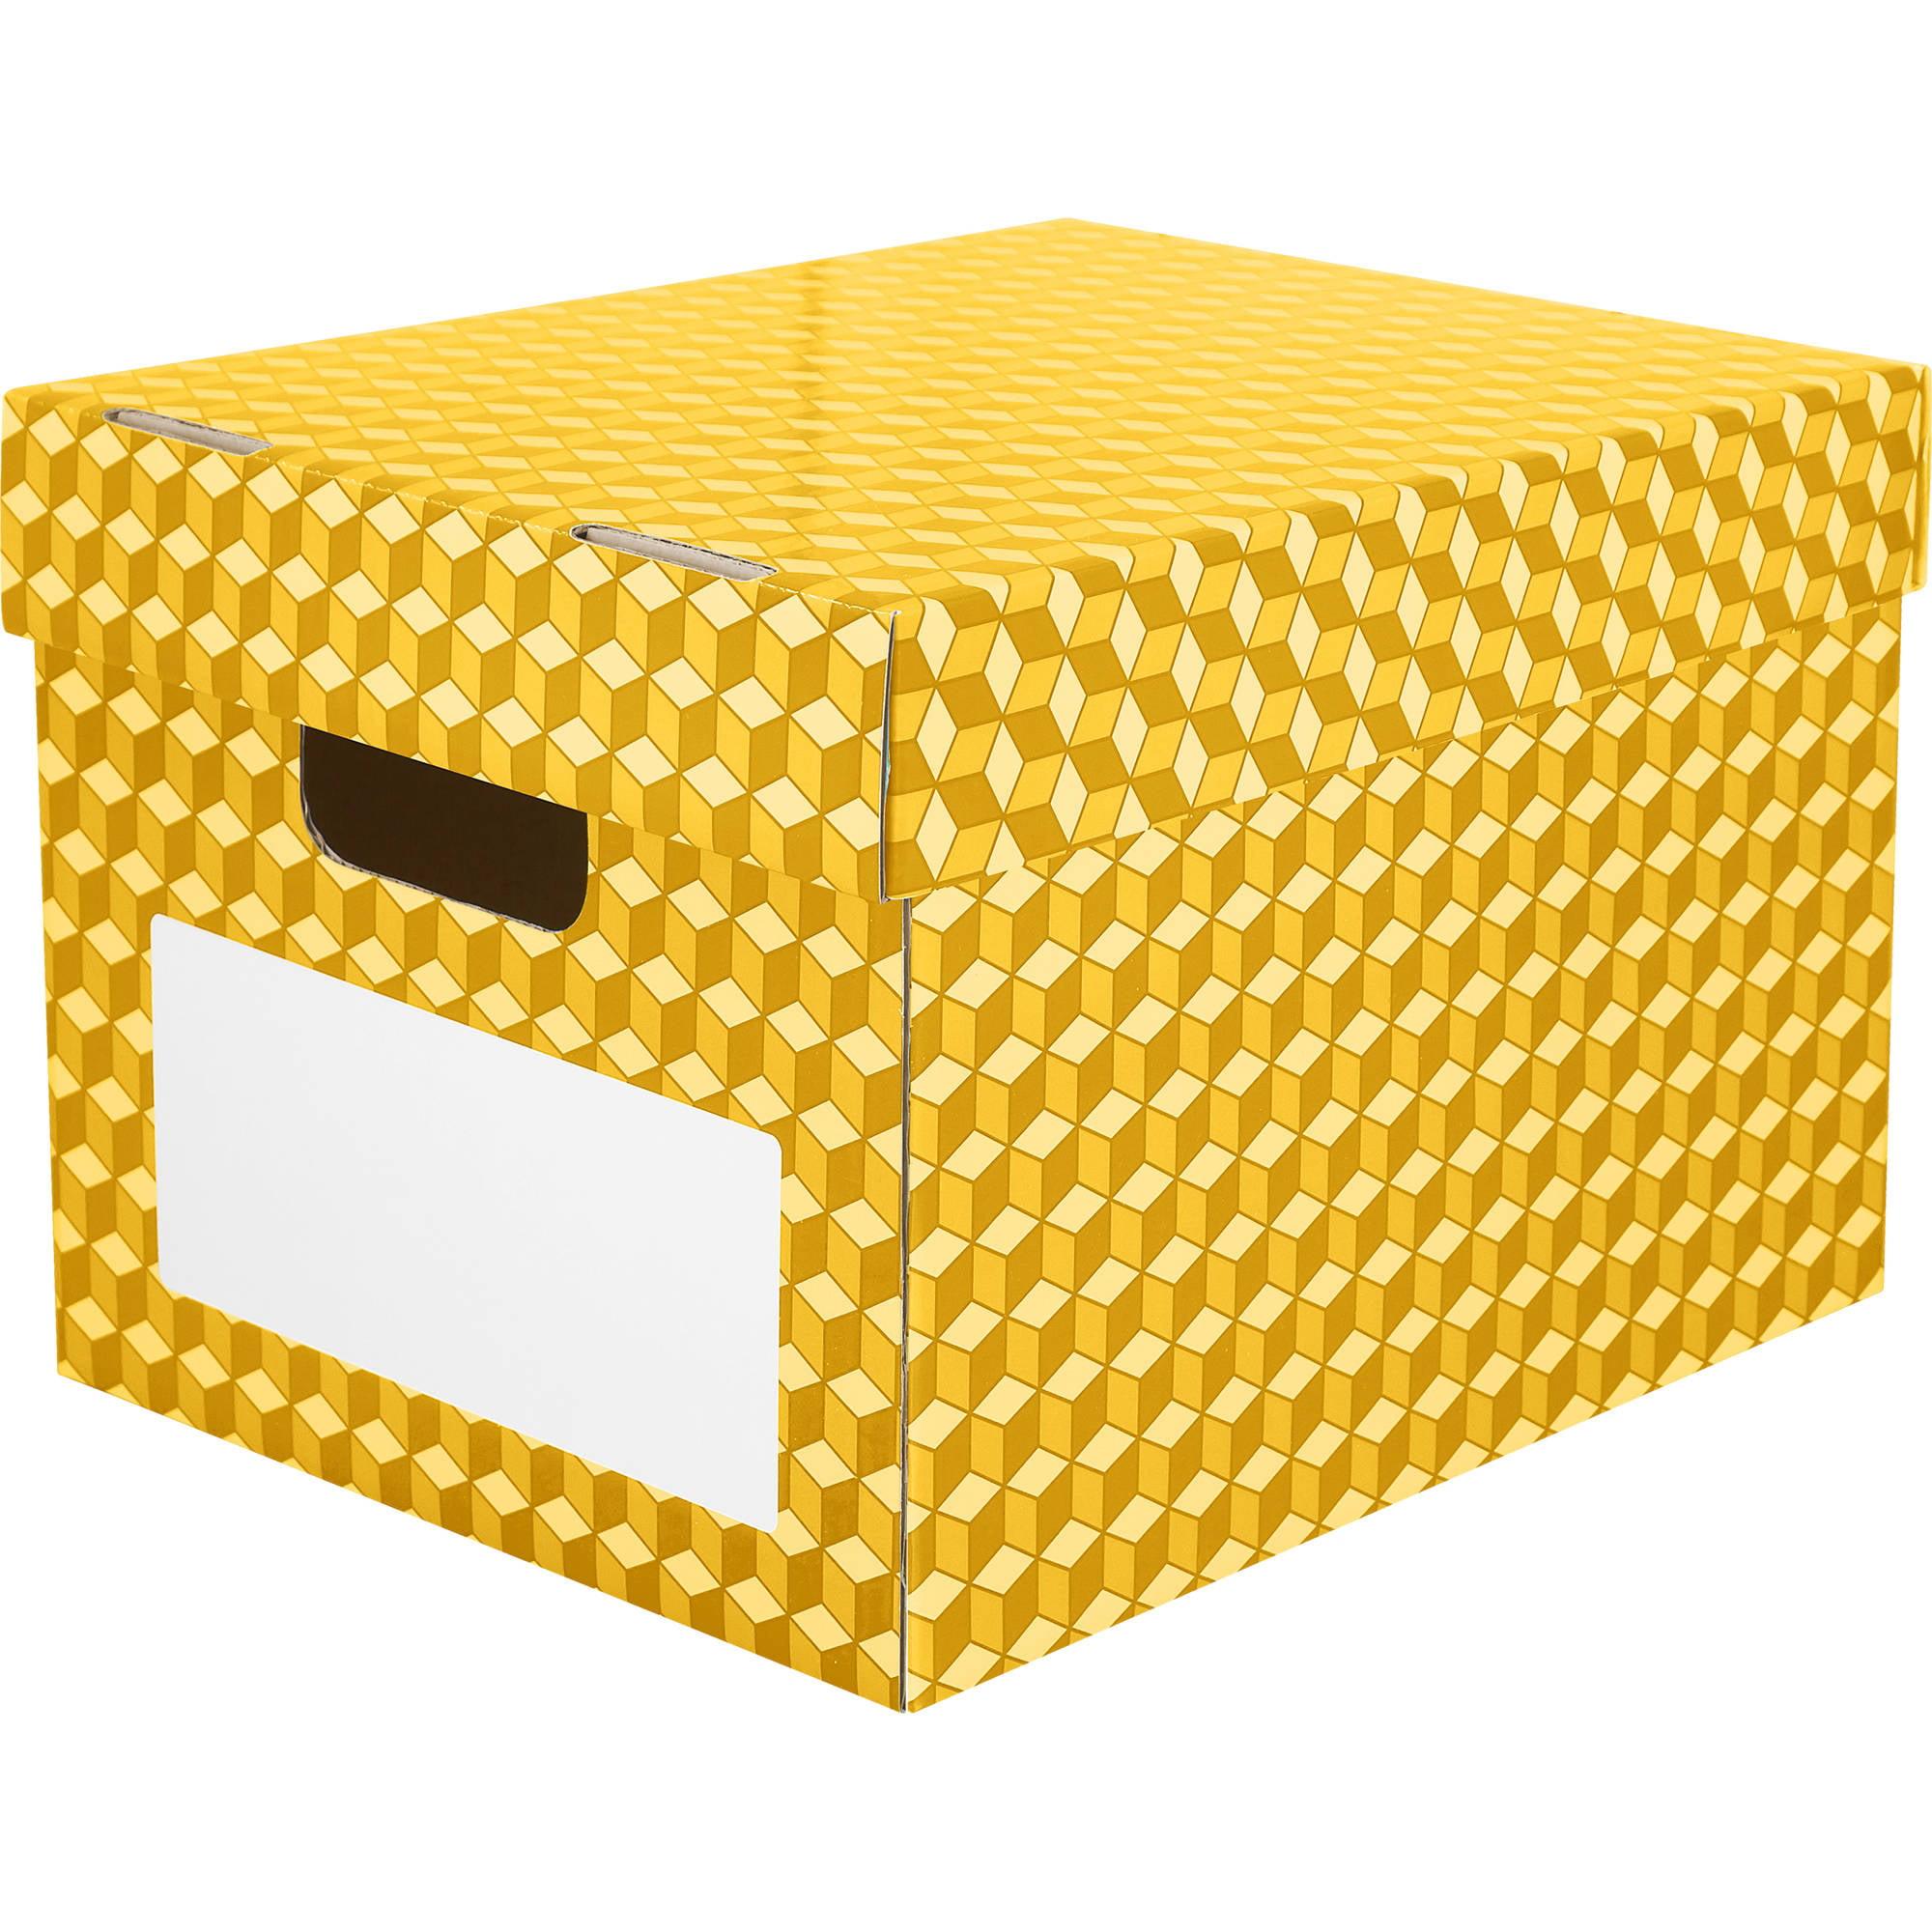 Corrugated File Totes, Set of 6